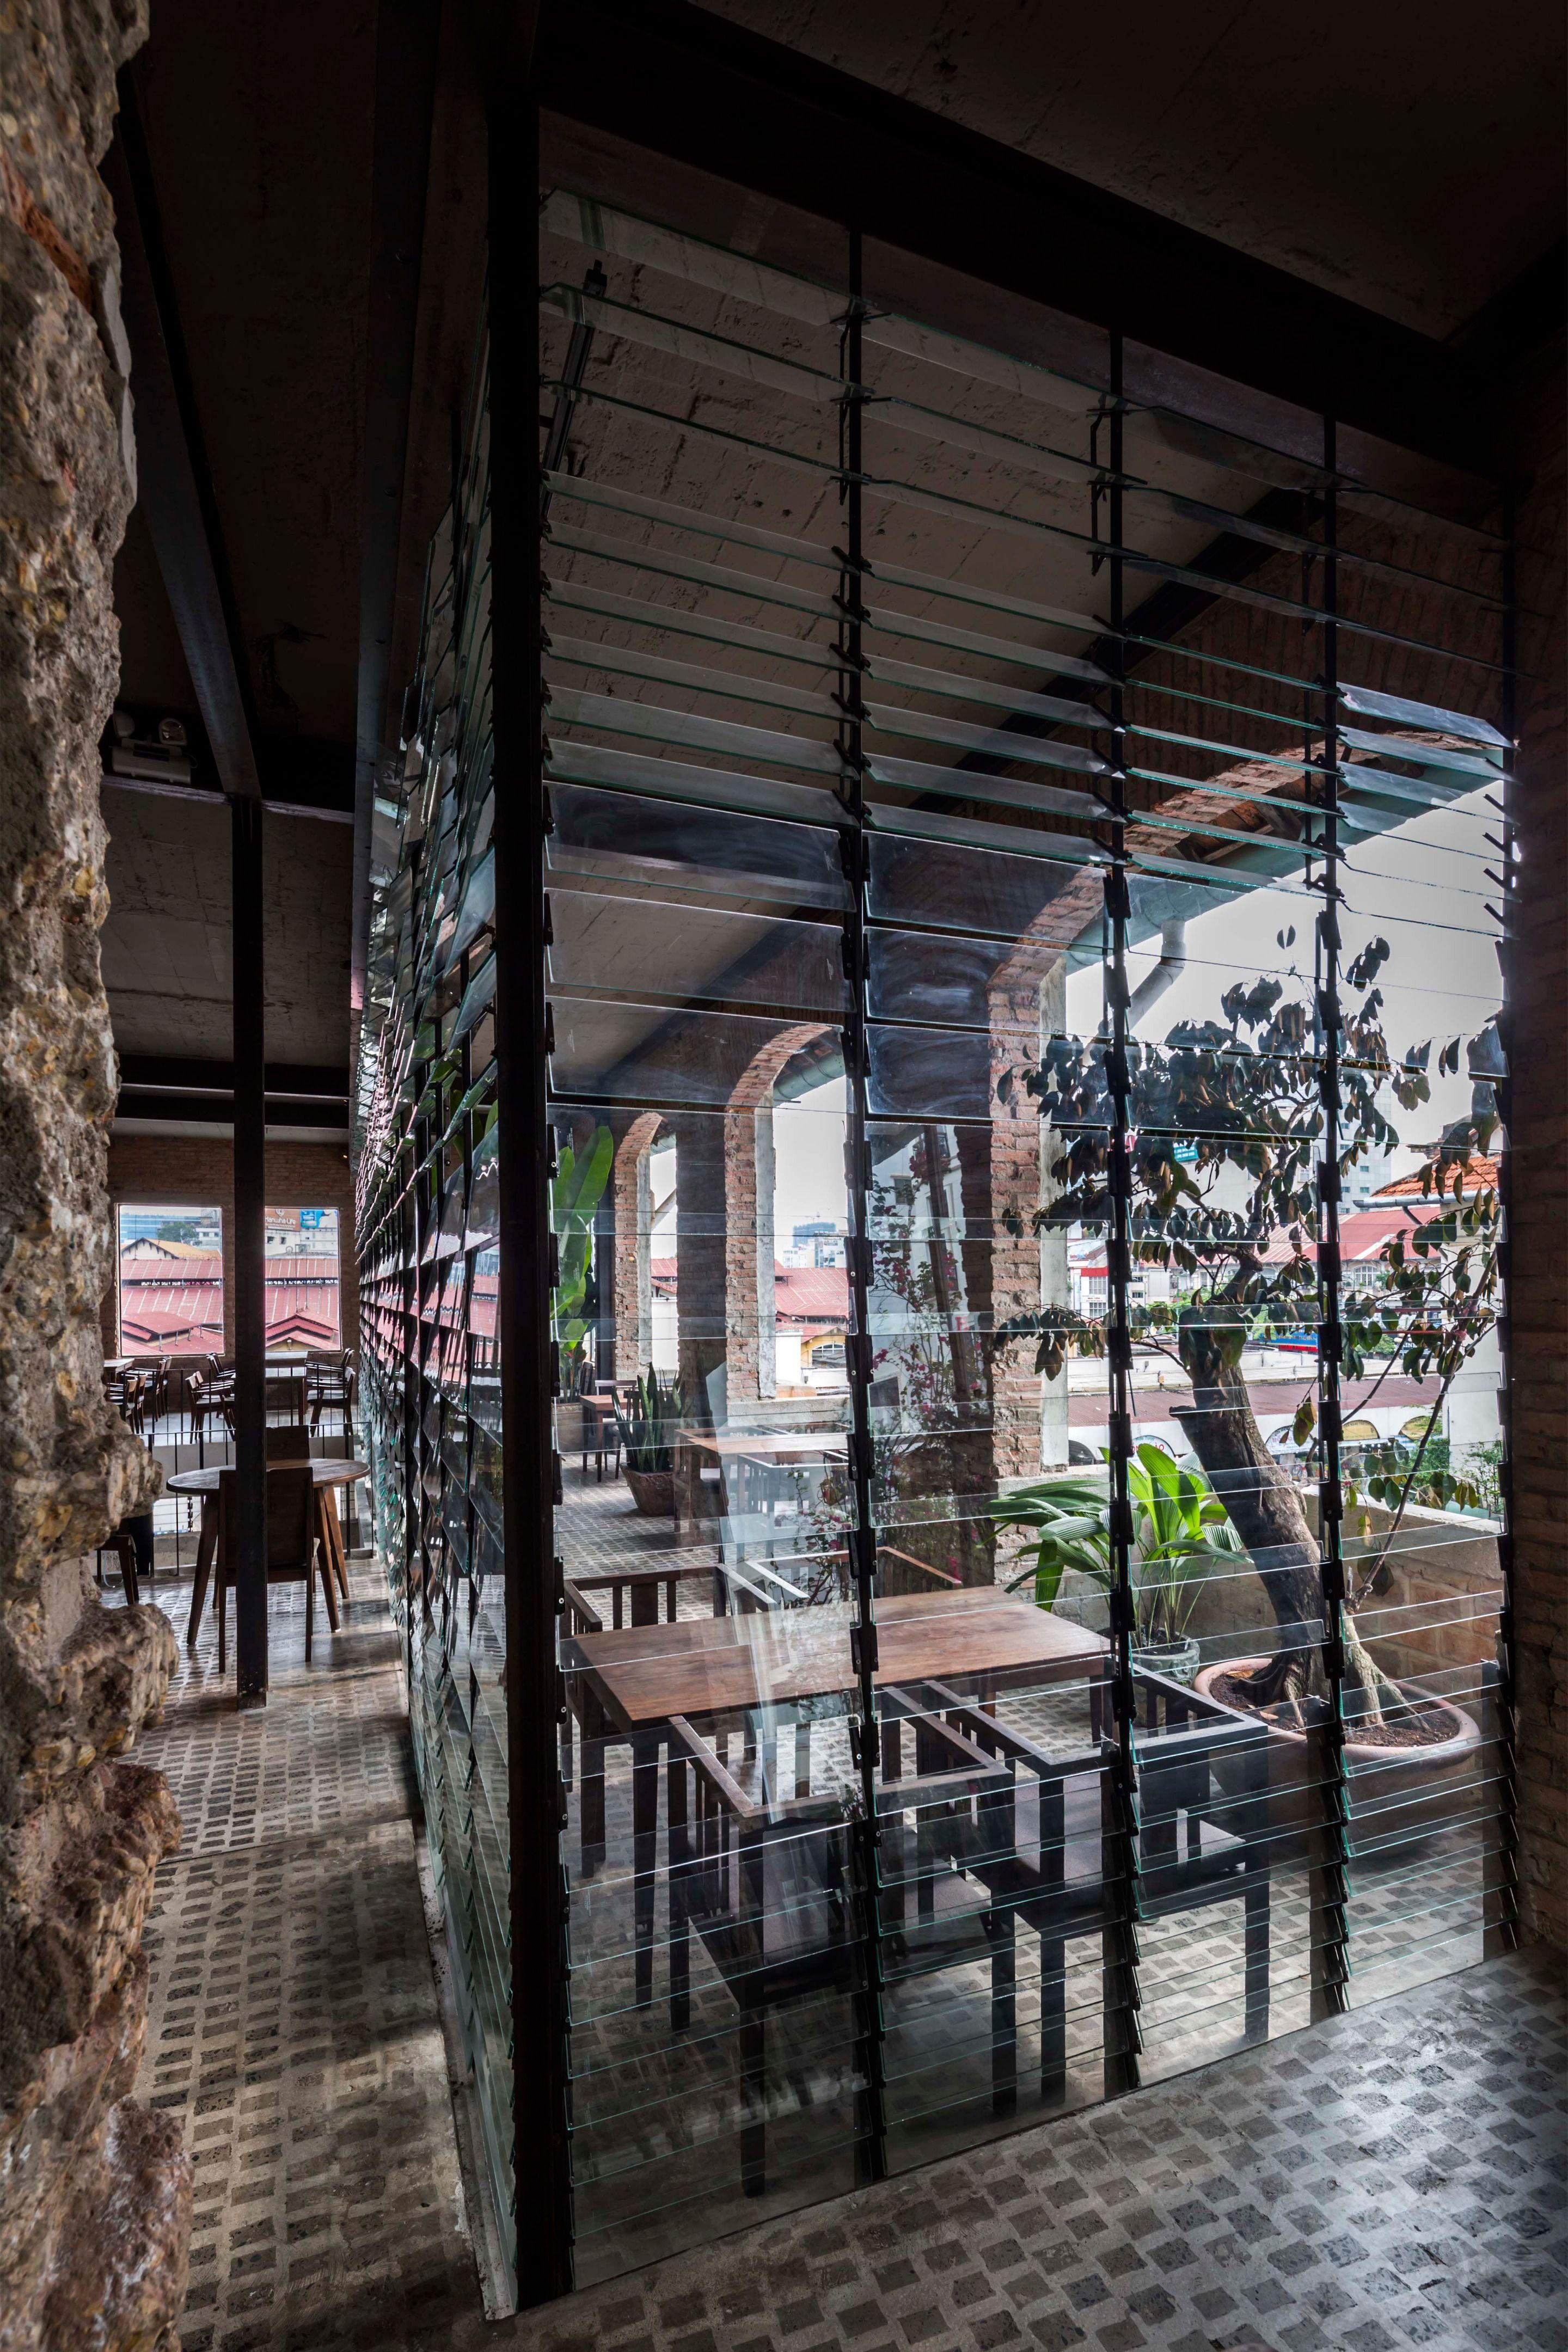 Best Ben Thanh Restaurant Picture Gallery In 2020 400 x 300